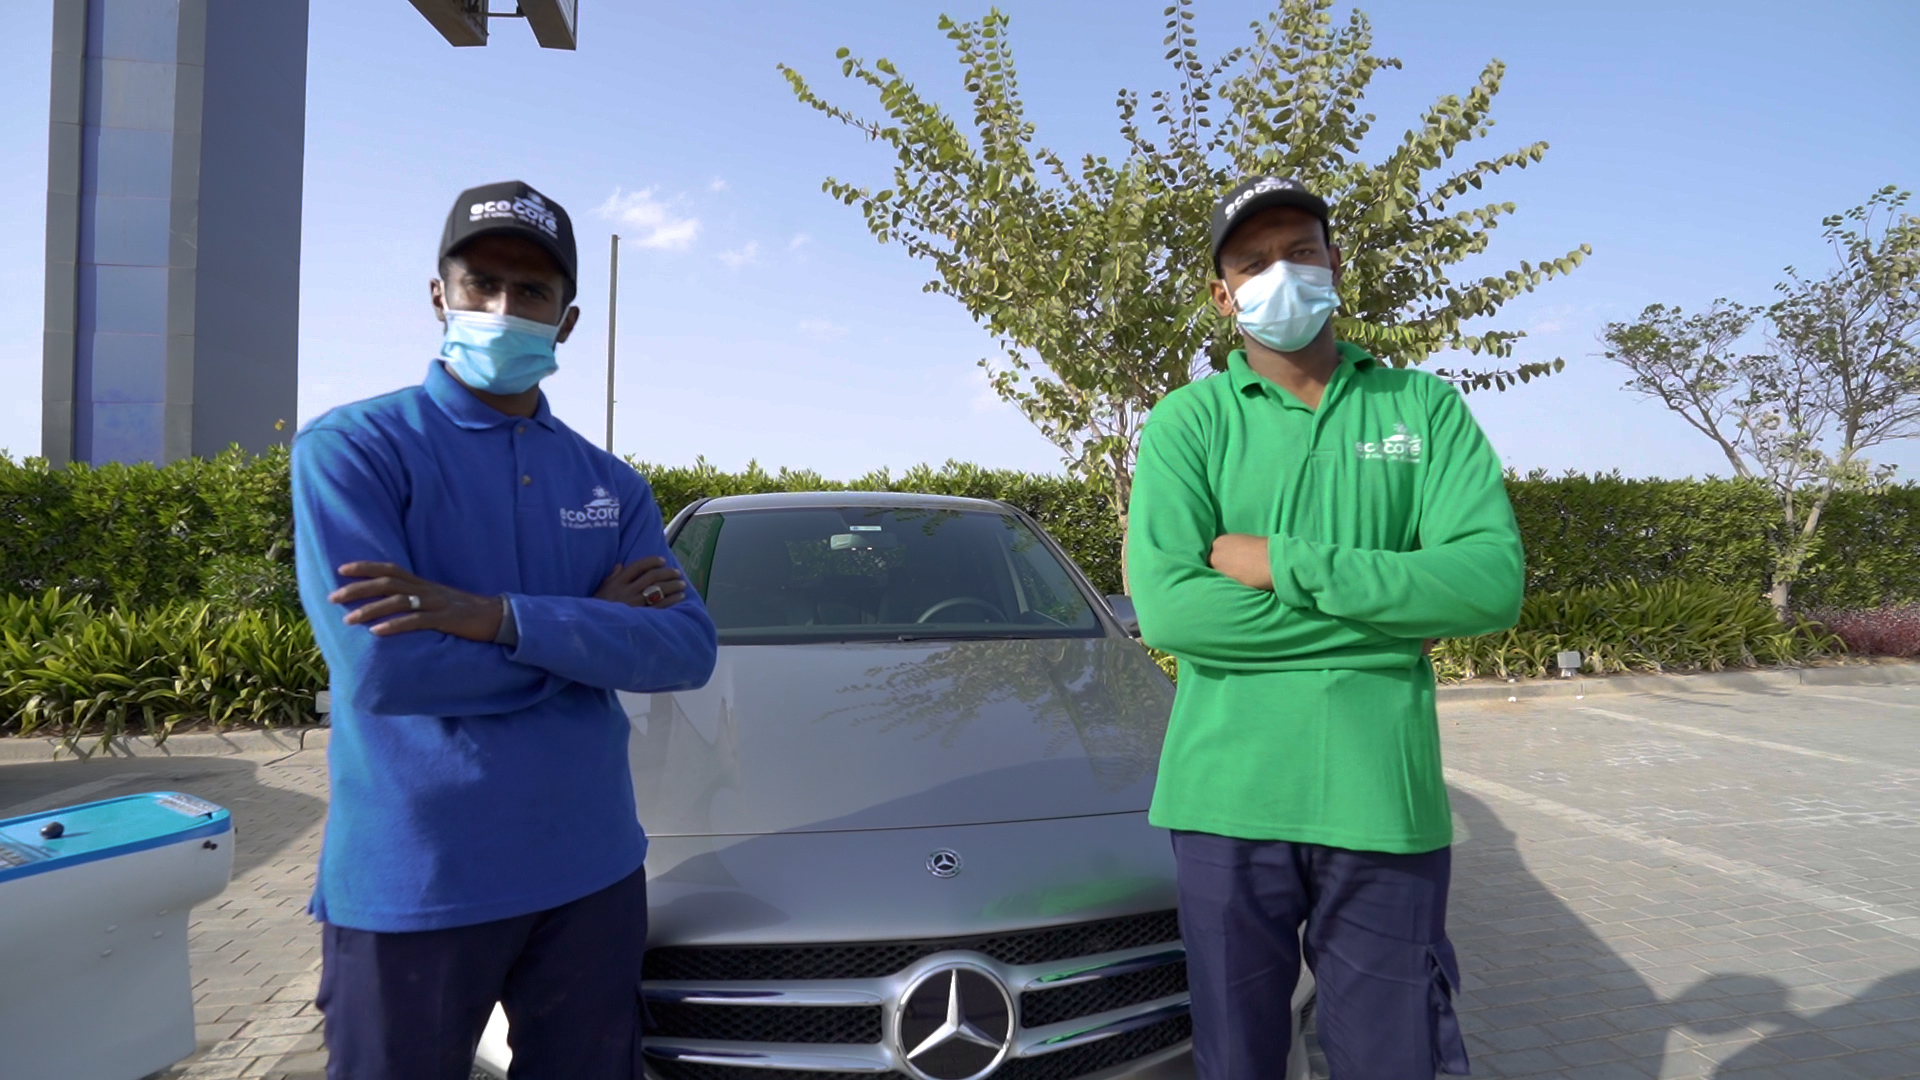 Eco Care: Bringing Eco-Friendly Car Washes to Egypt